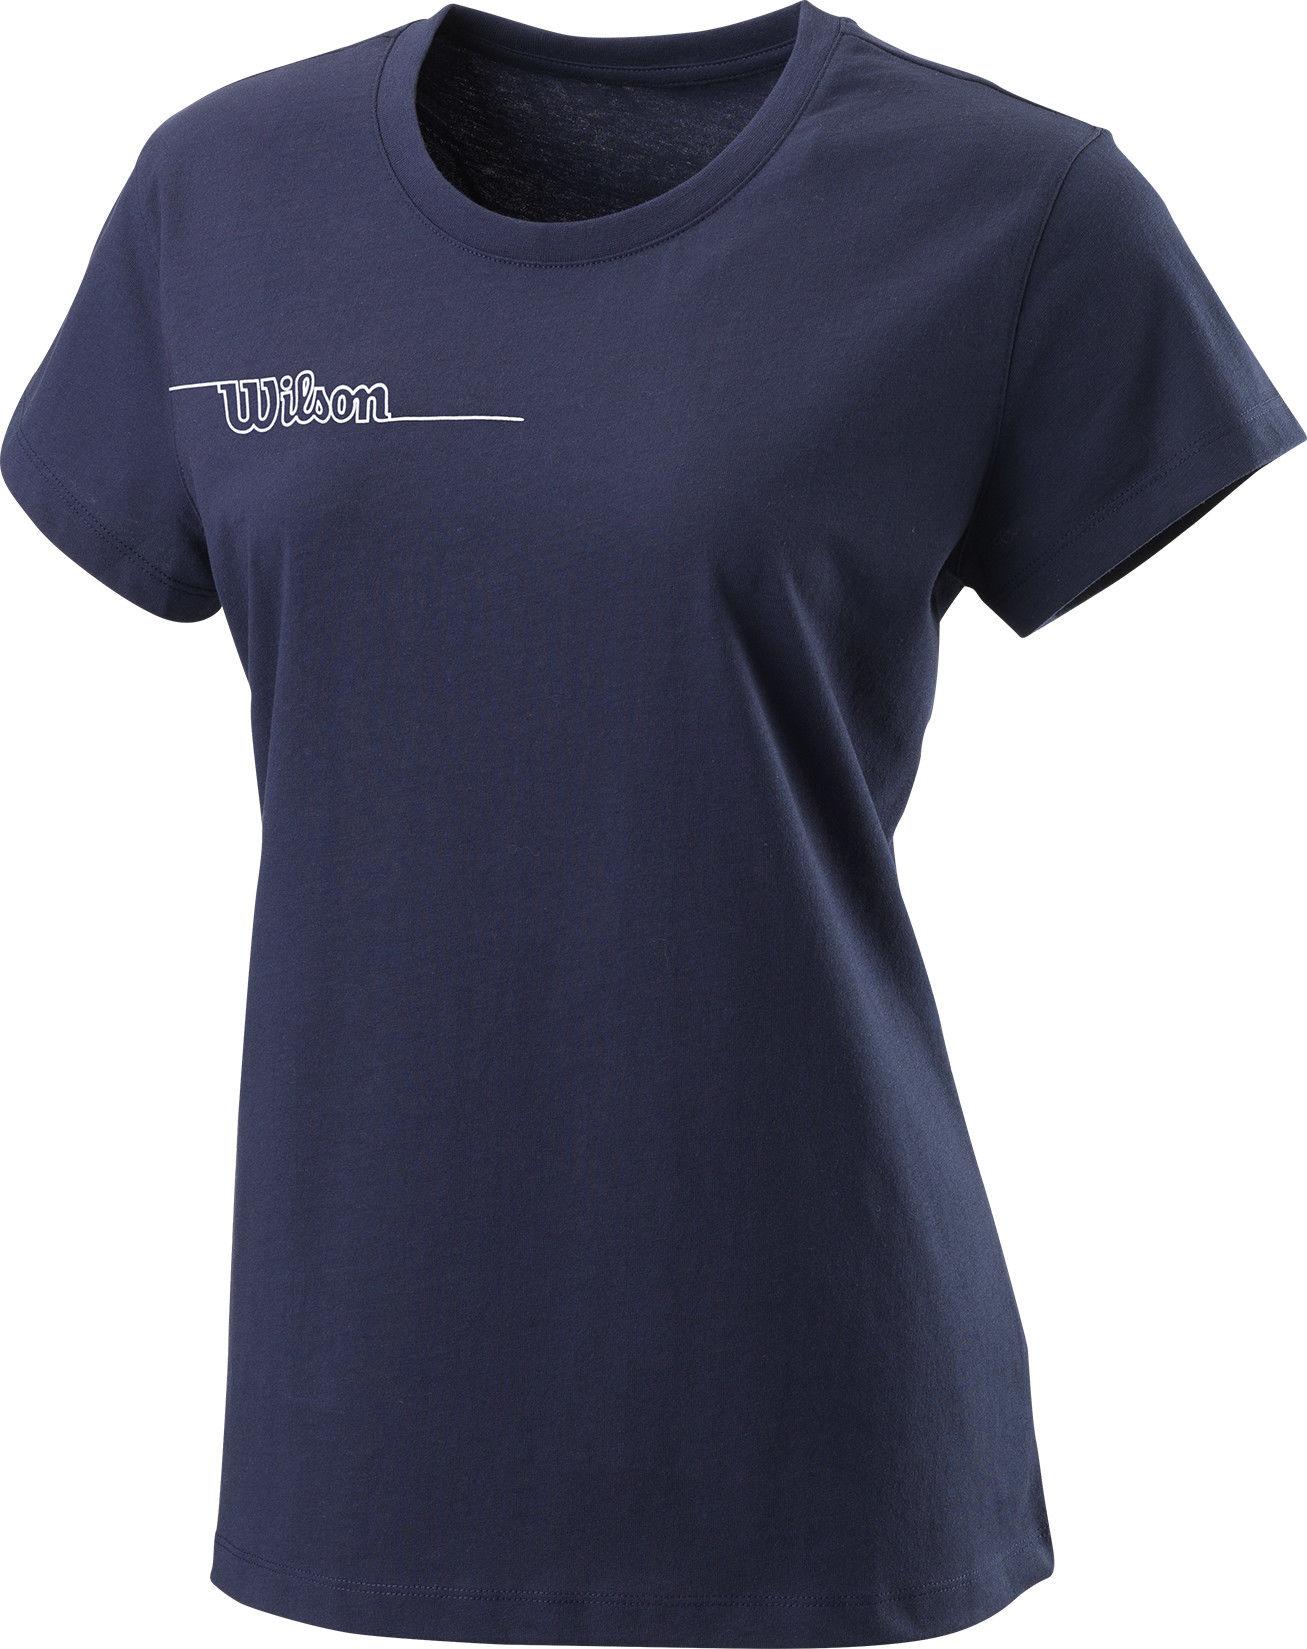 Wilson Team II Tech Tee Women - navy